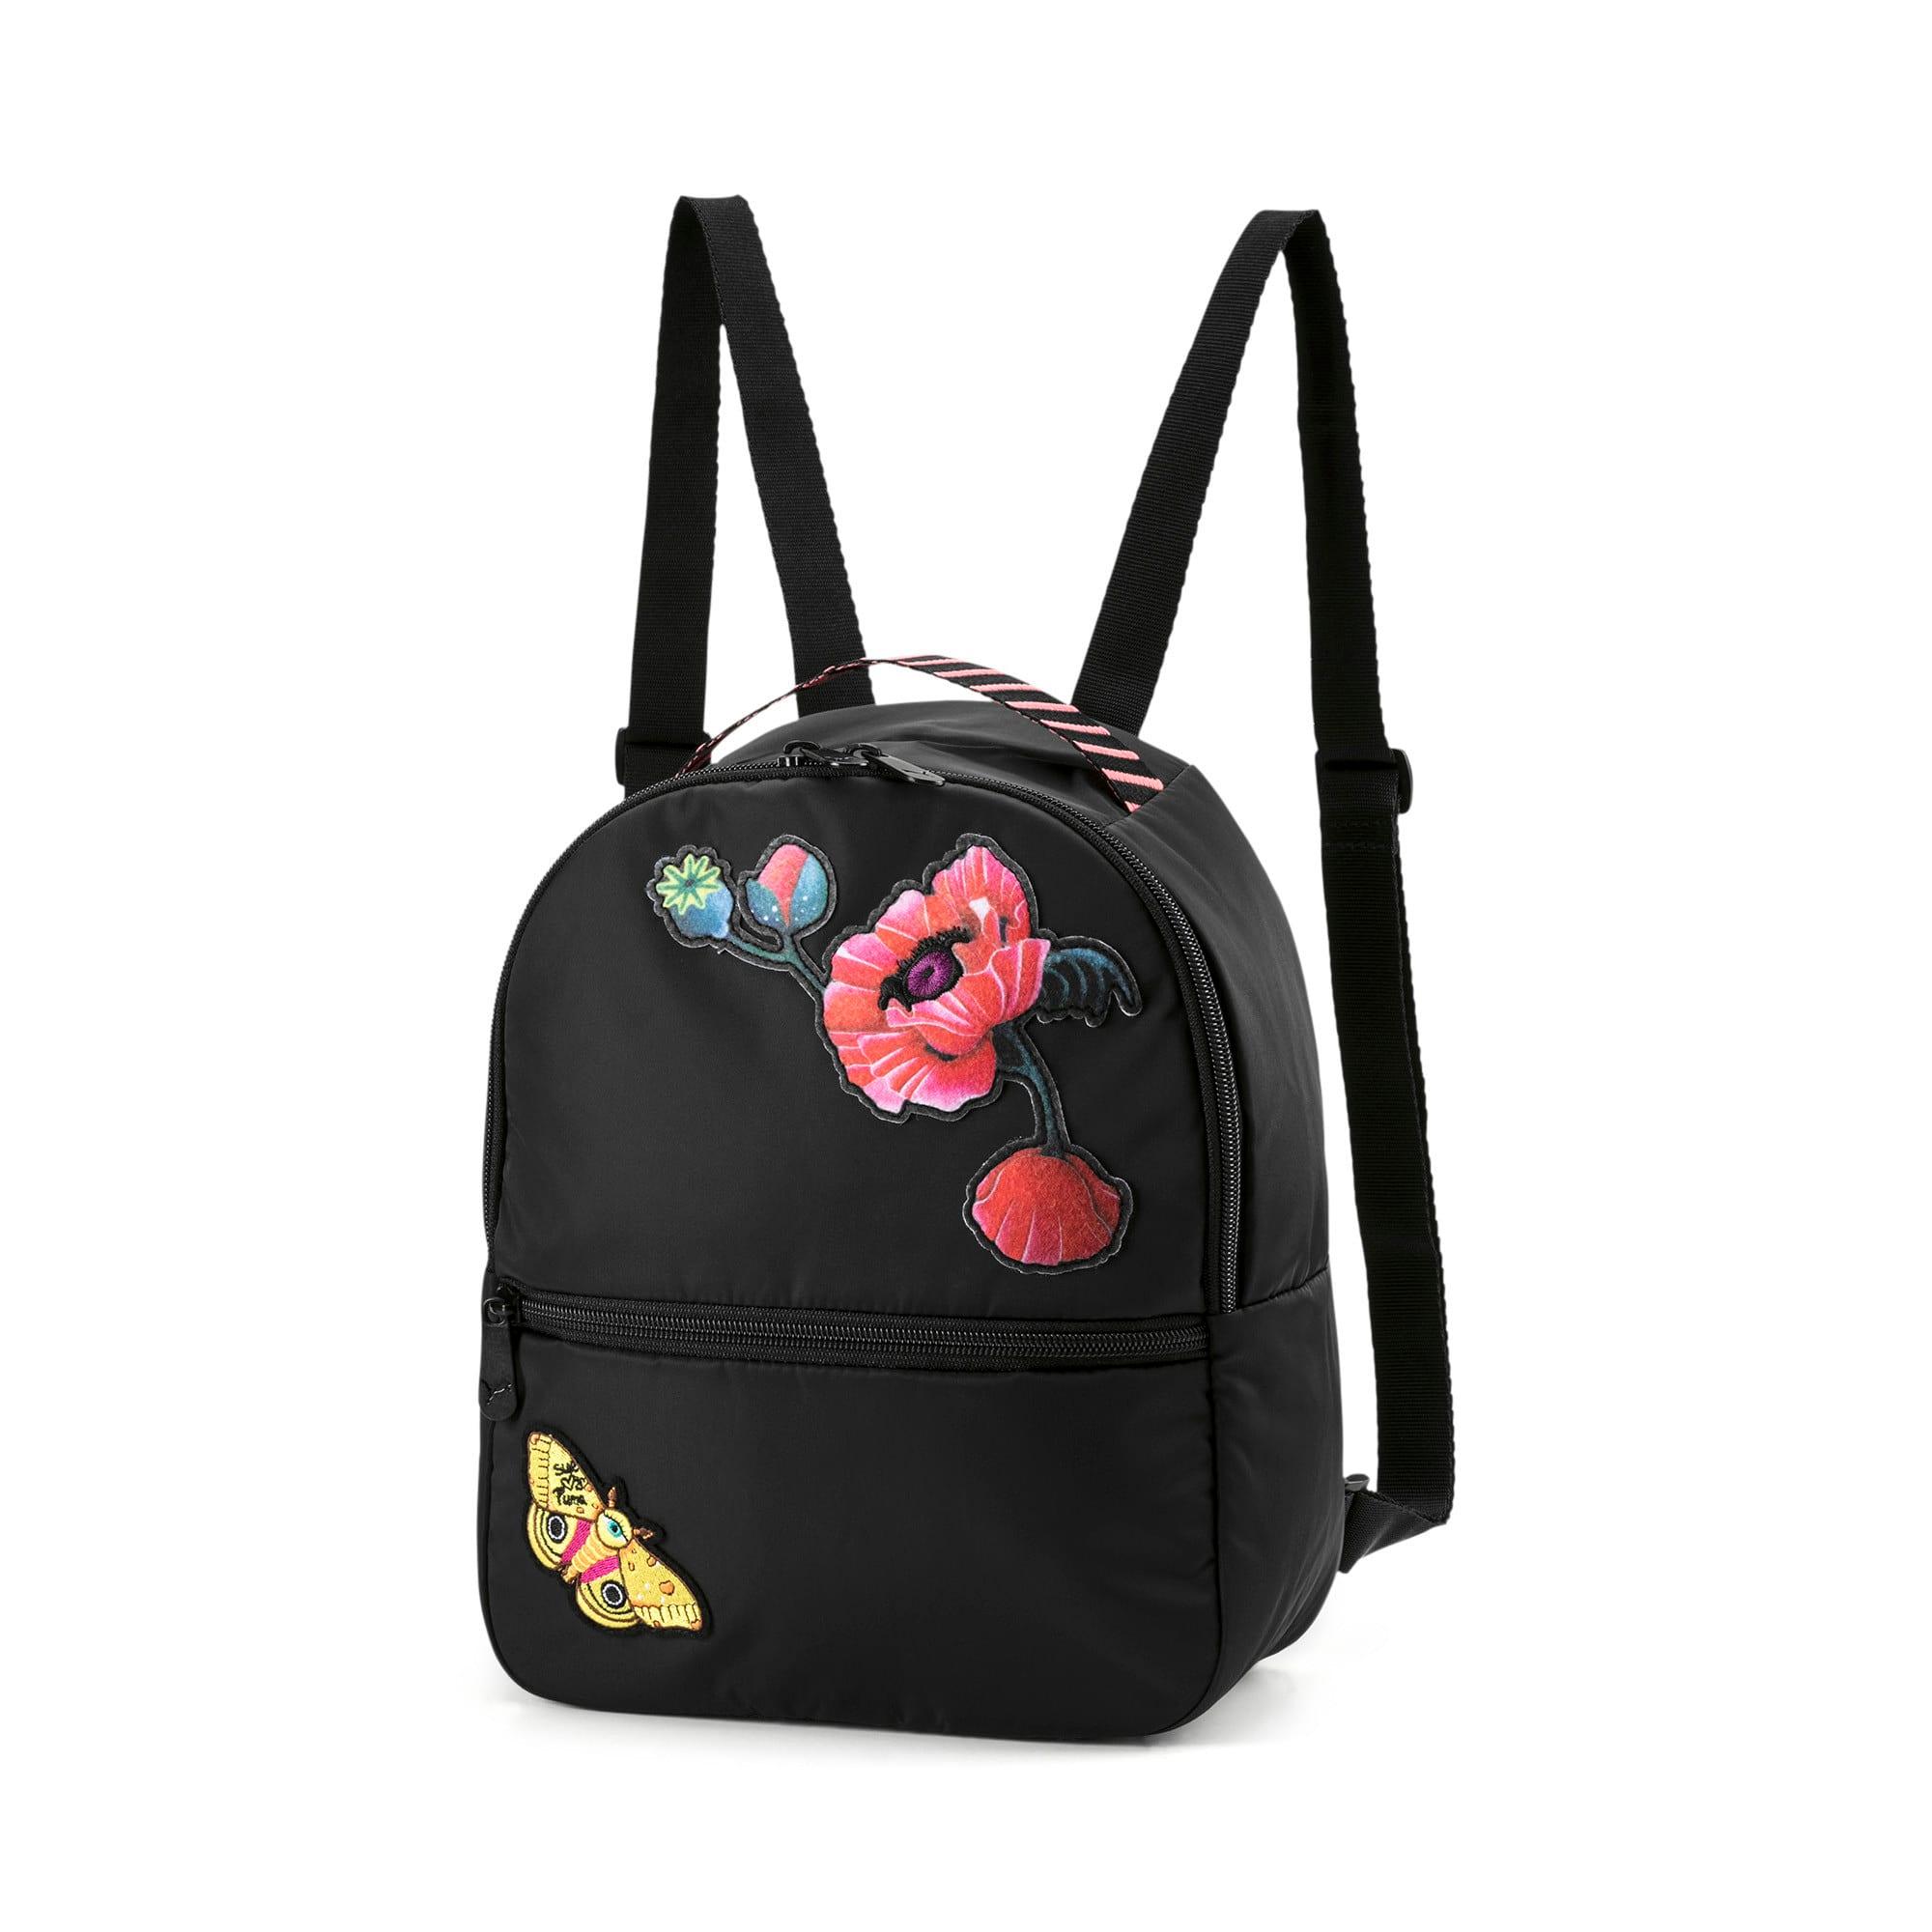 Thumbnail 1 of PUMA x SUE TSAI Backpack, Puma Black, medium